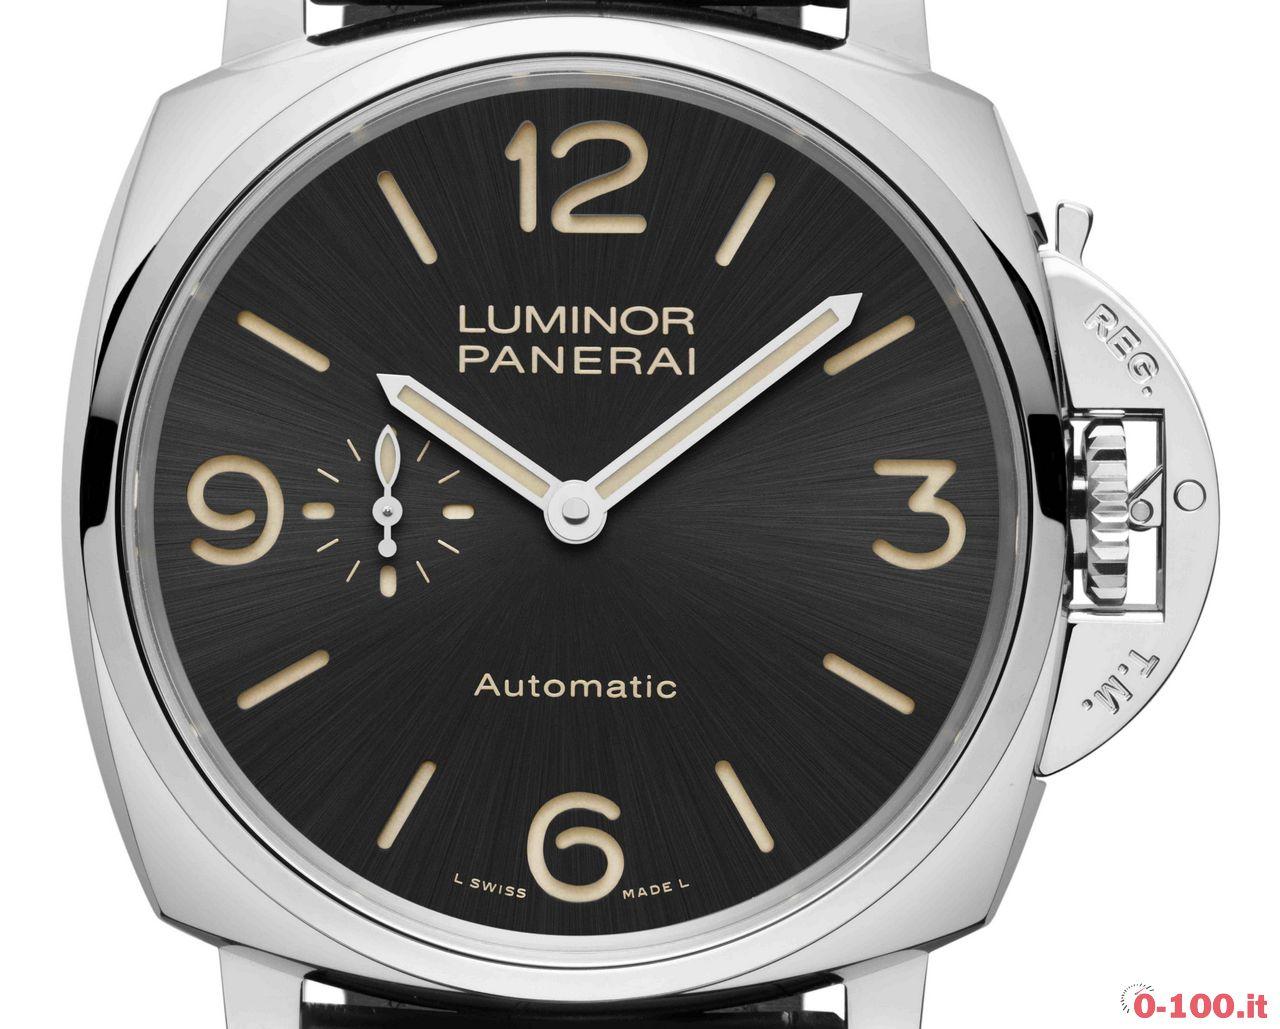 officine-panerai-luminor-due-3-days-automatic-pam00674-prezzo-price_0-1008